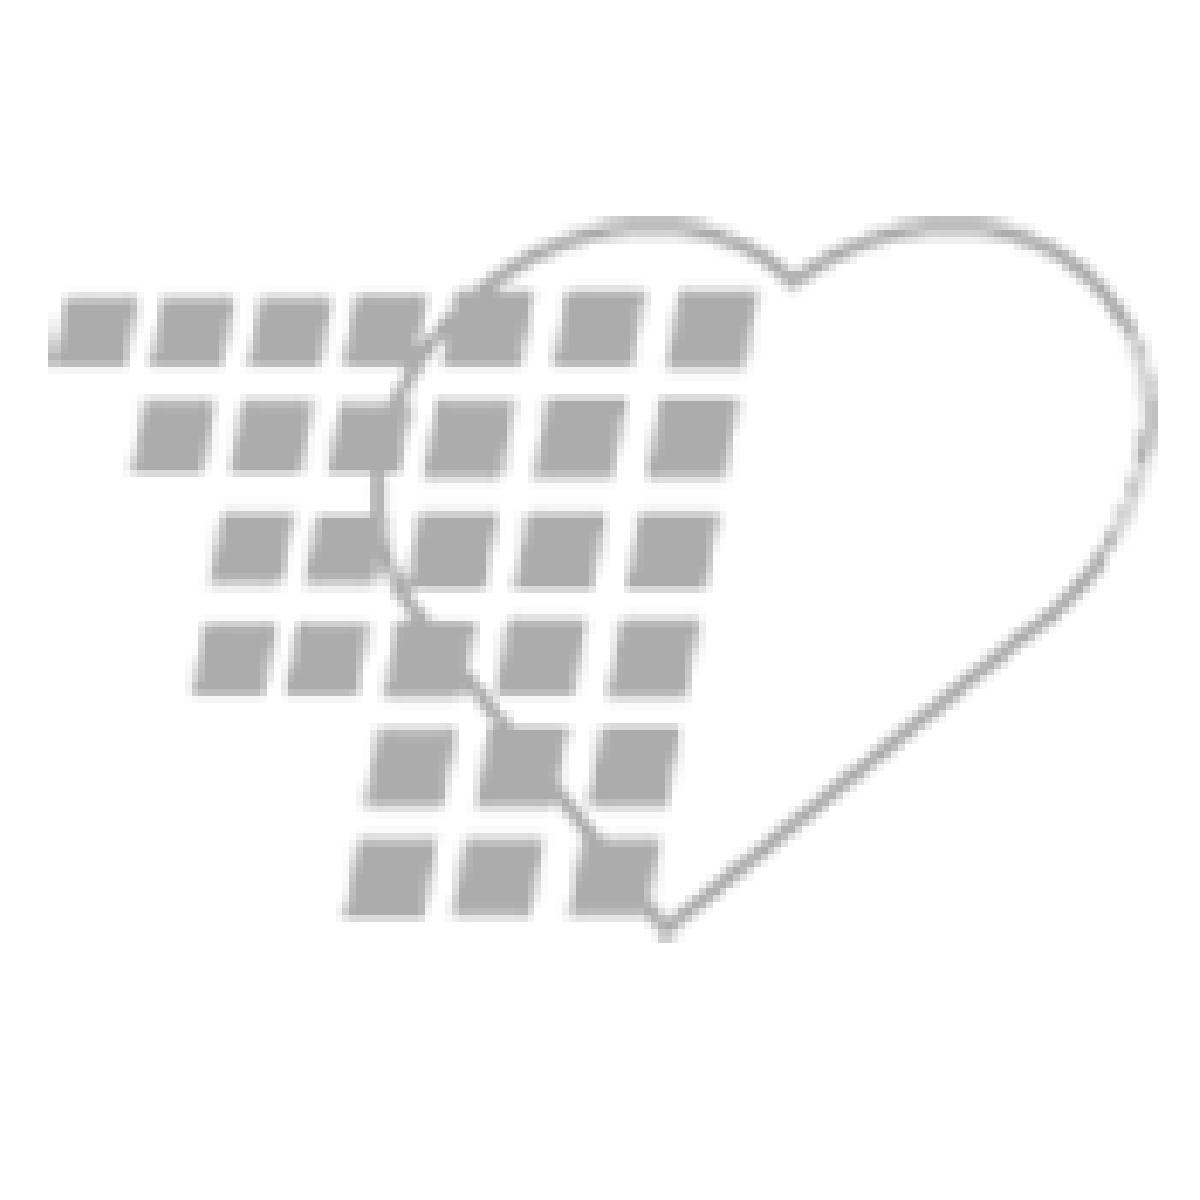 04-25-9724 KbPort™ SimCabRx™  Mini Pharmacy